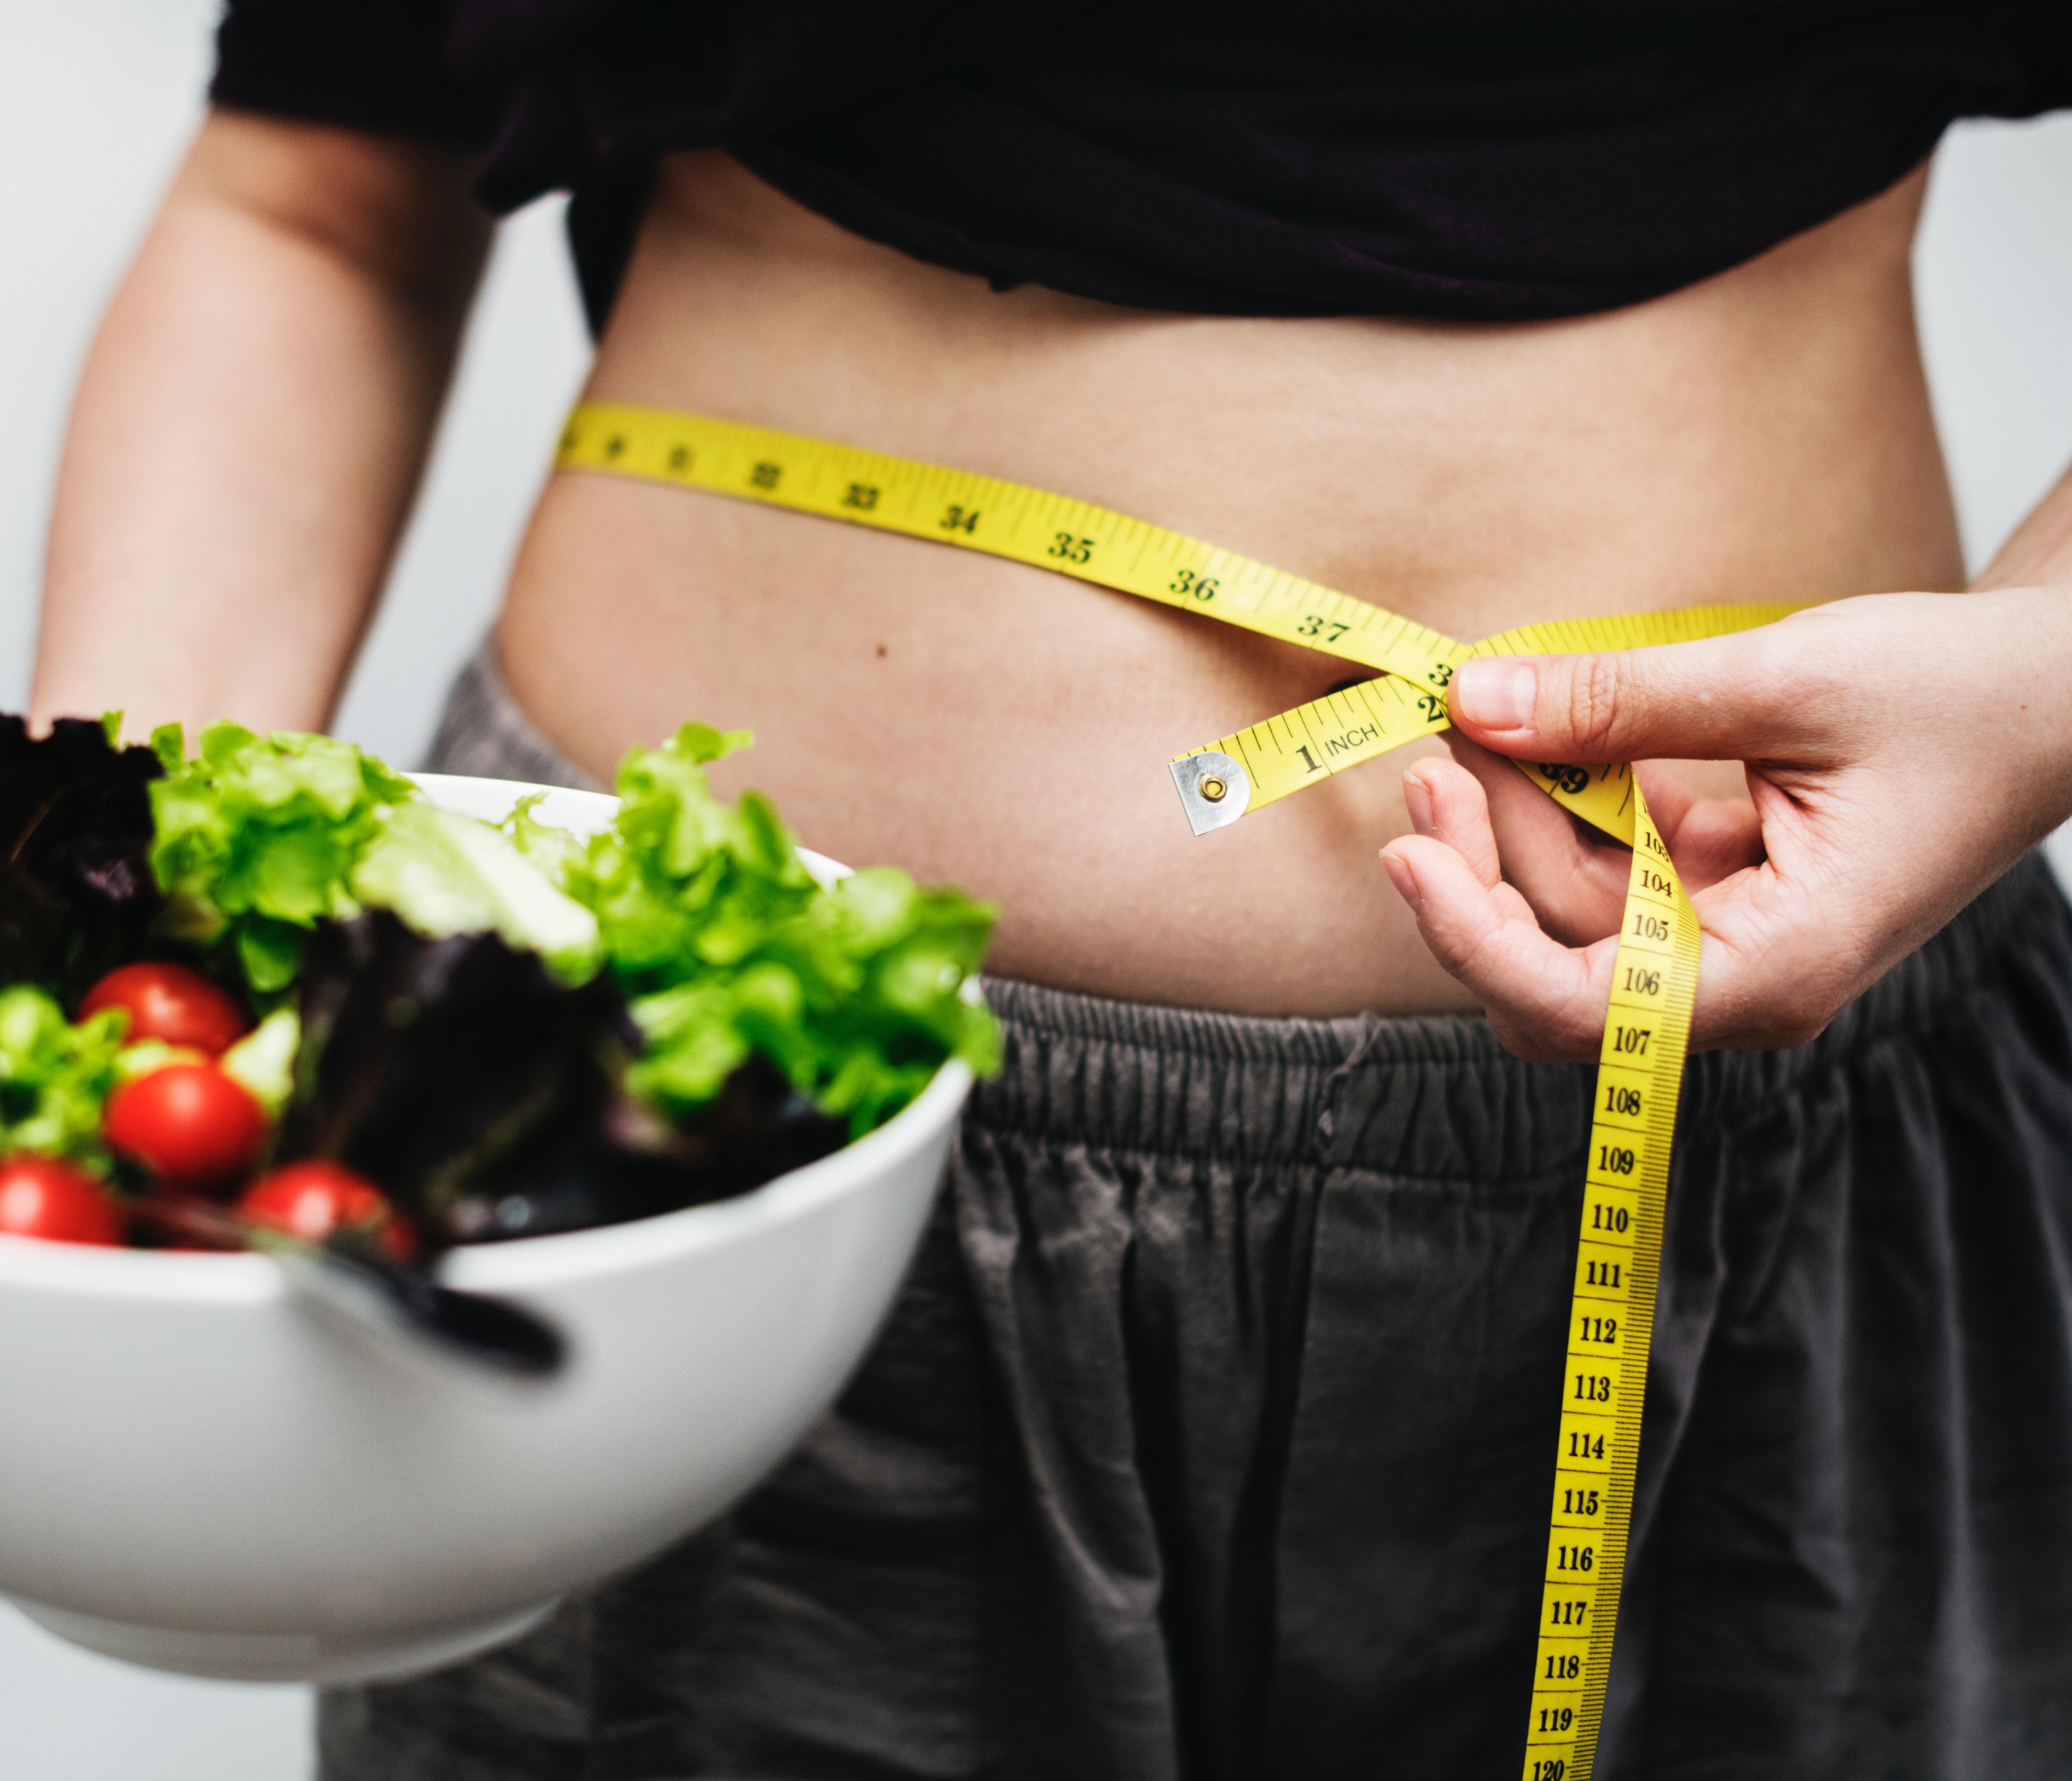 Har du irritabel tarm? (IBS)